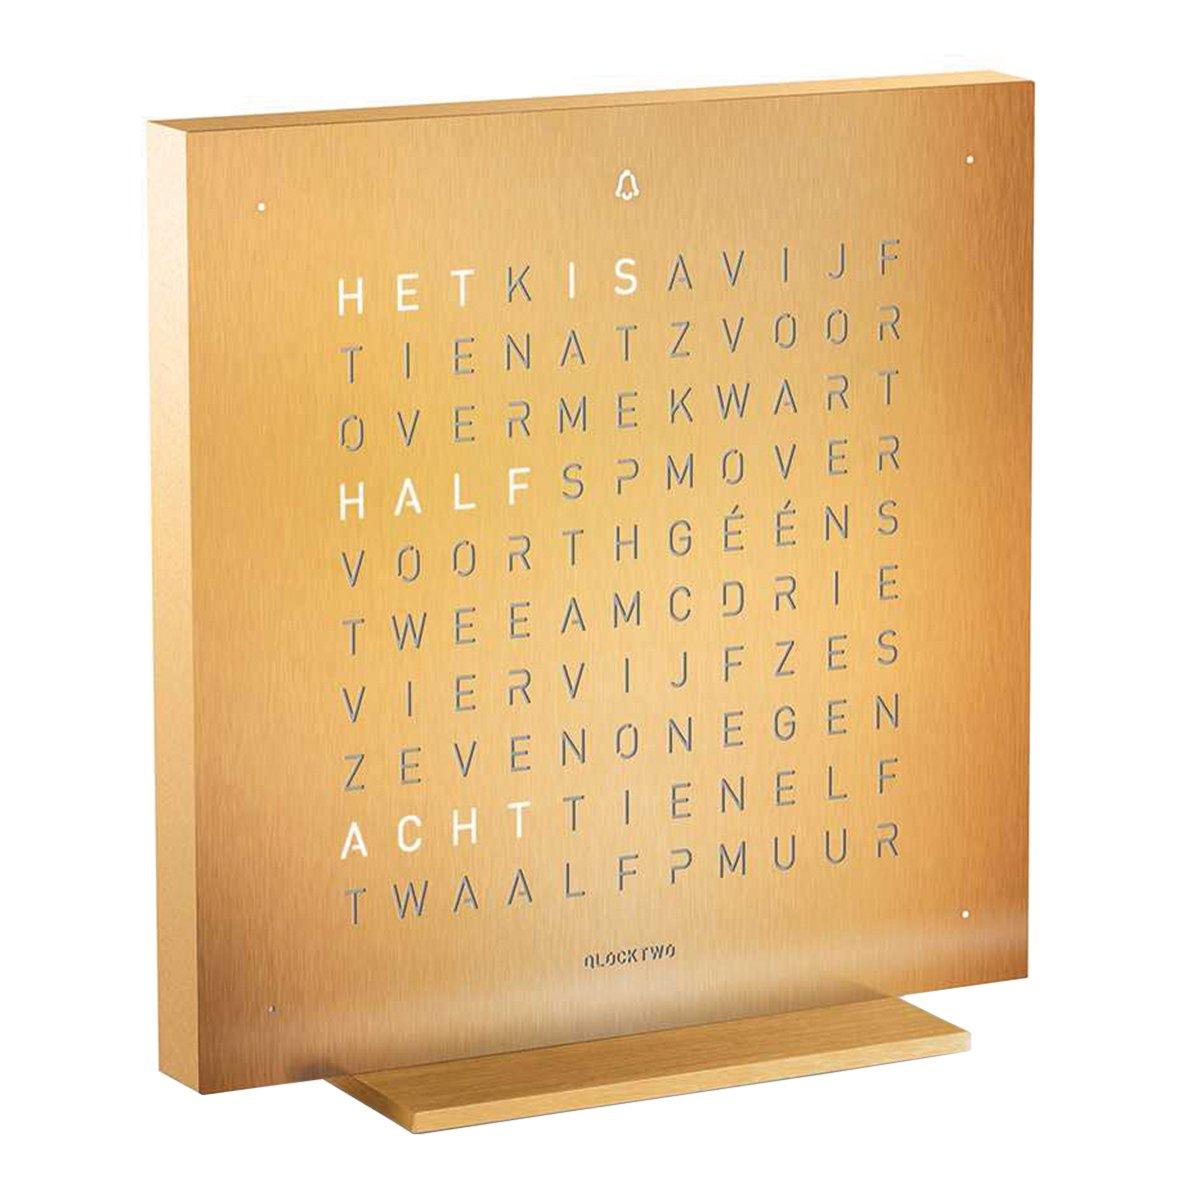 Qlocktwo Touch Metaal Tafelklok Nederlands - Biegert & Funk - Golden Legend